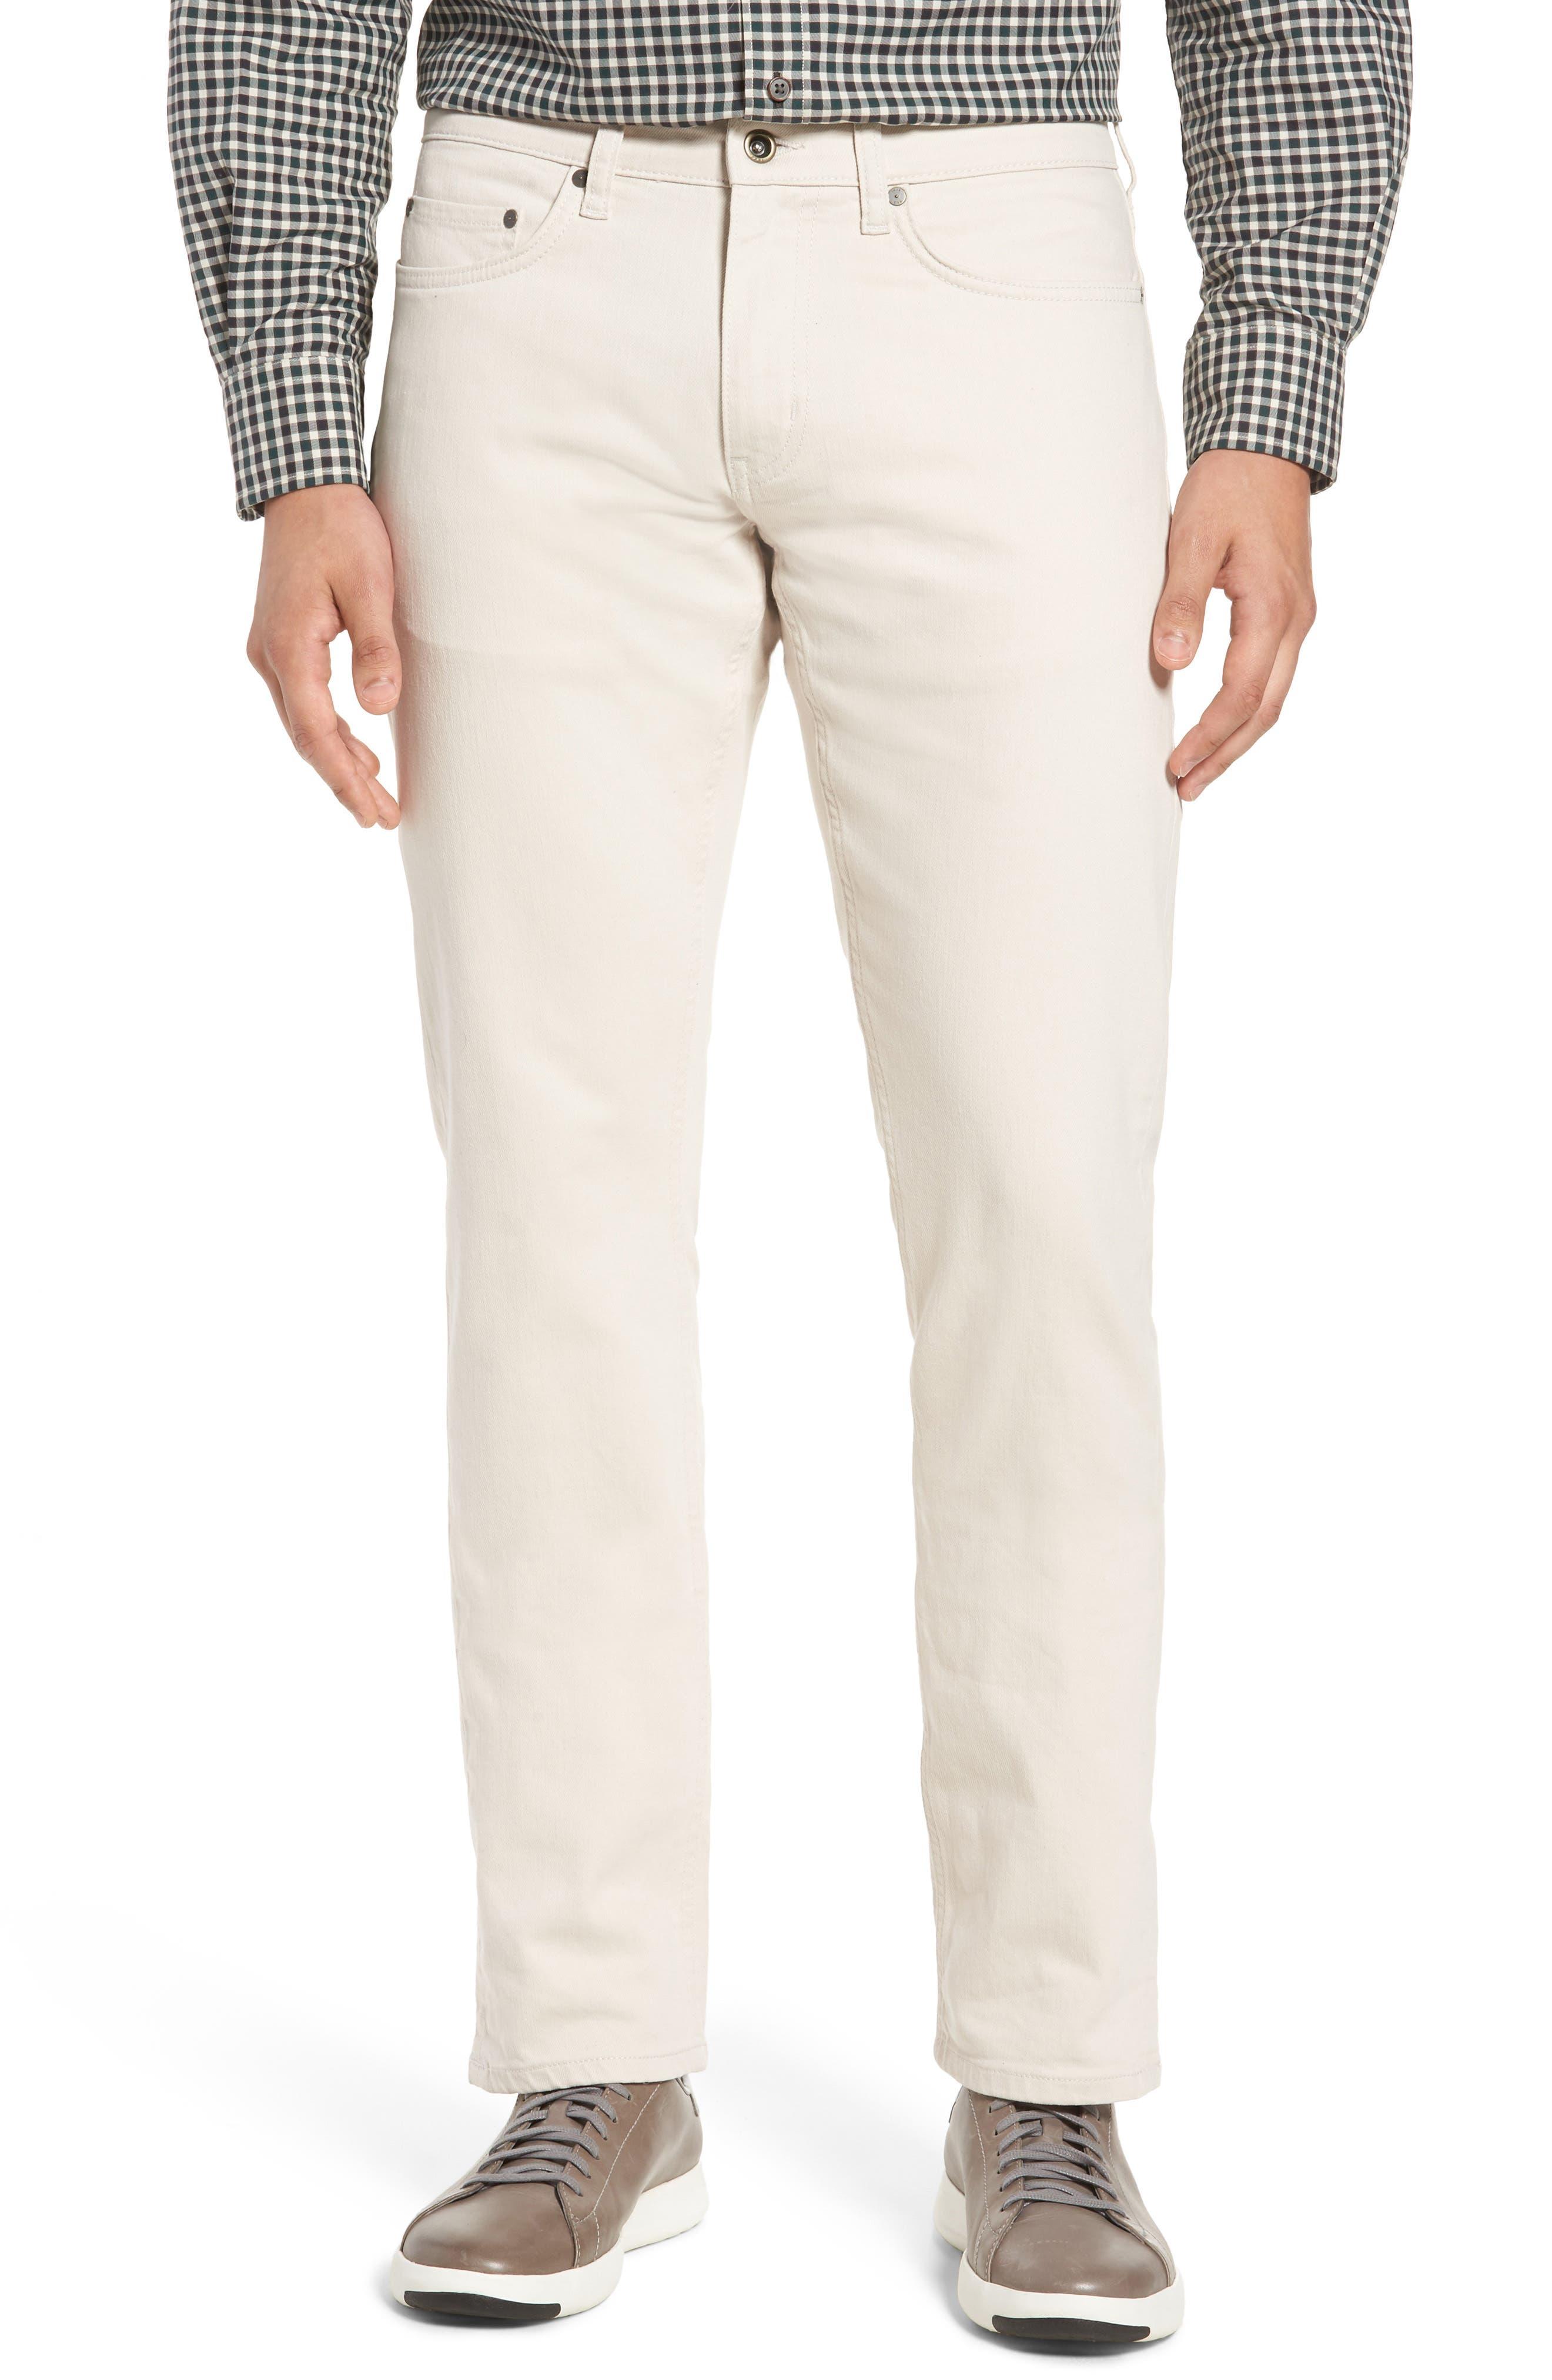 Dartmouth Straight Leg Pants,                         Main,                         color, Pumice